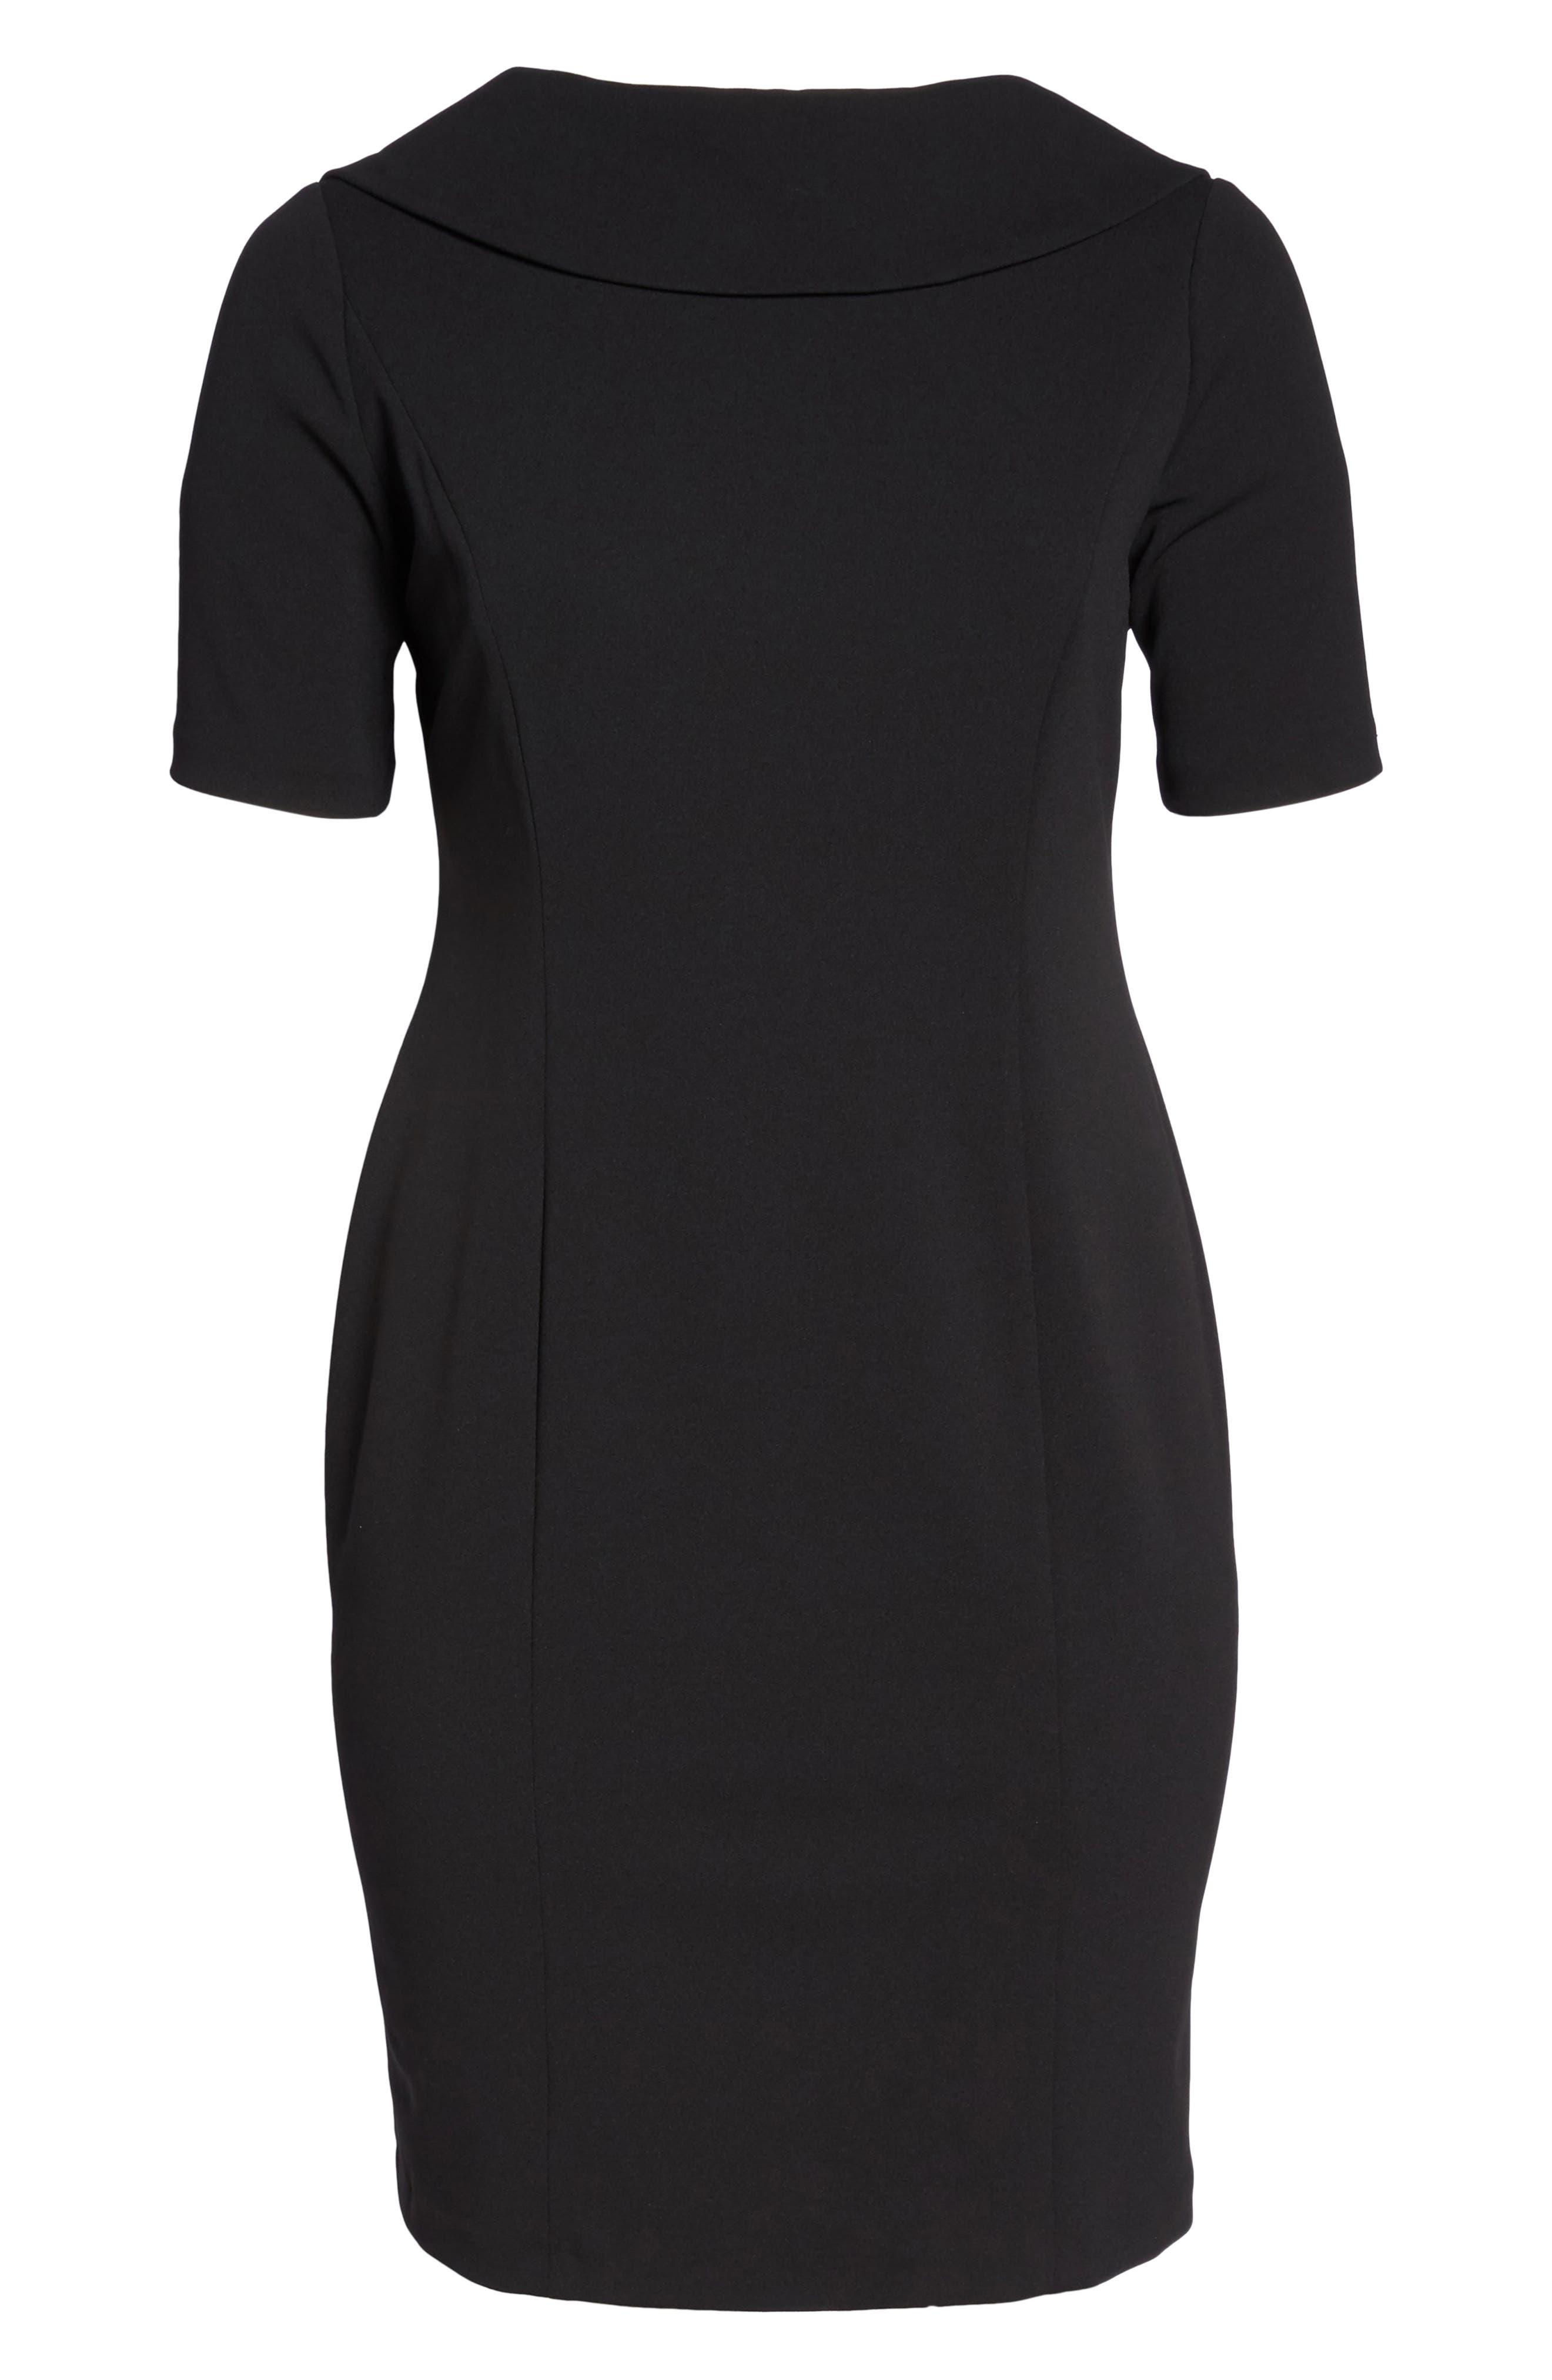 Wrap Dress,                             Alternate thumbnail 7, color,                             Black Crepe